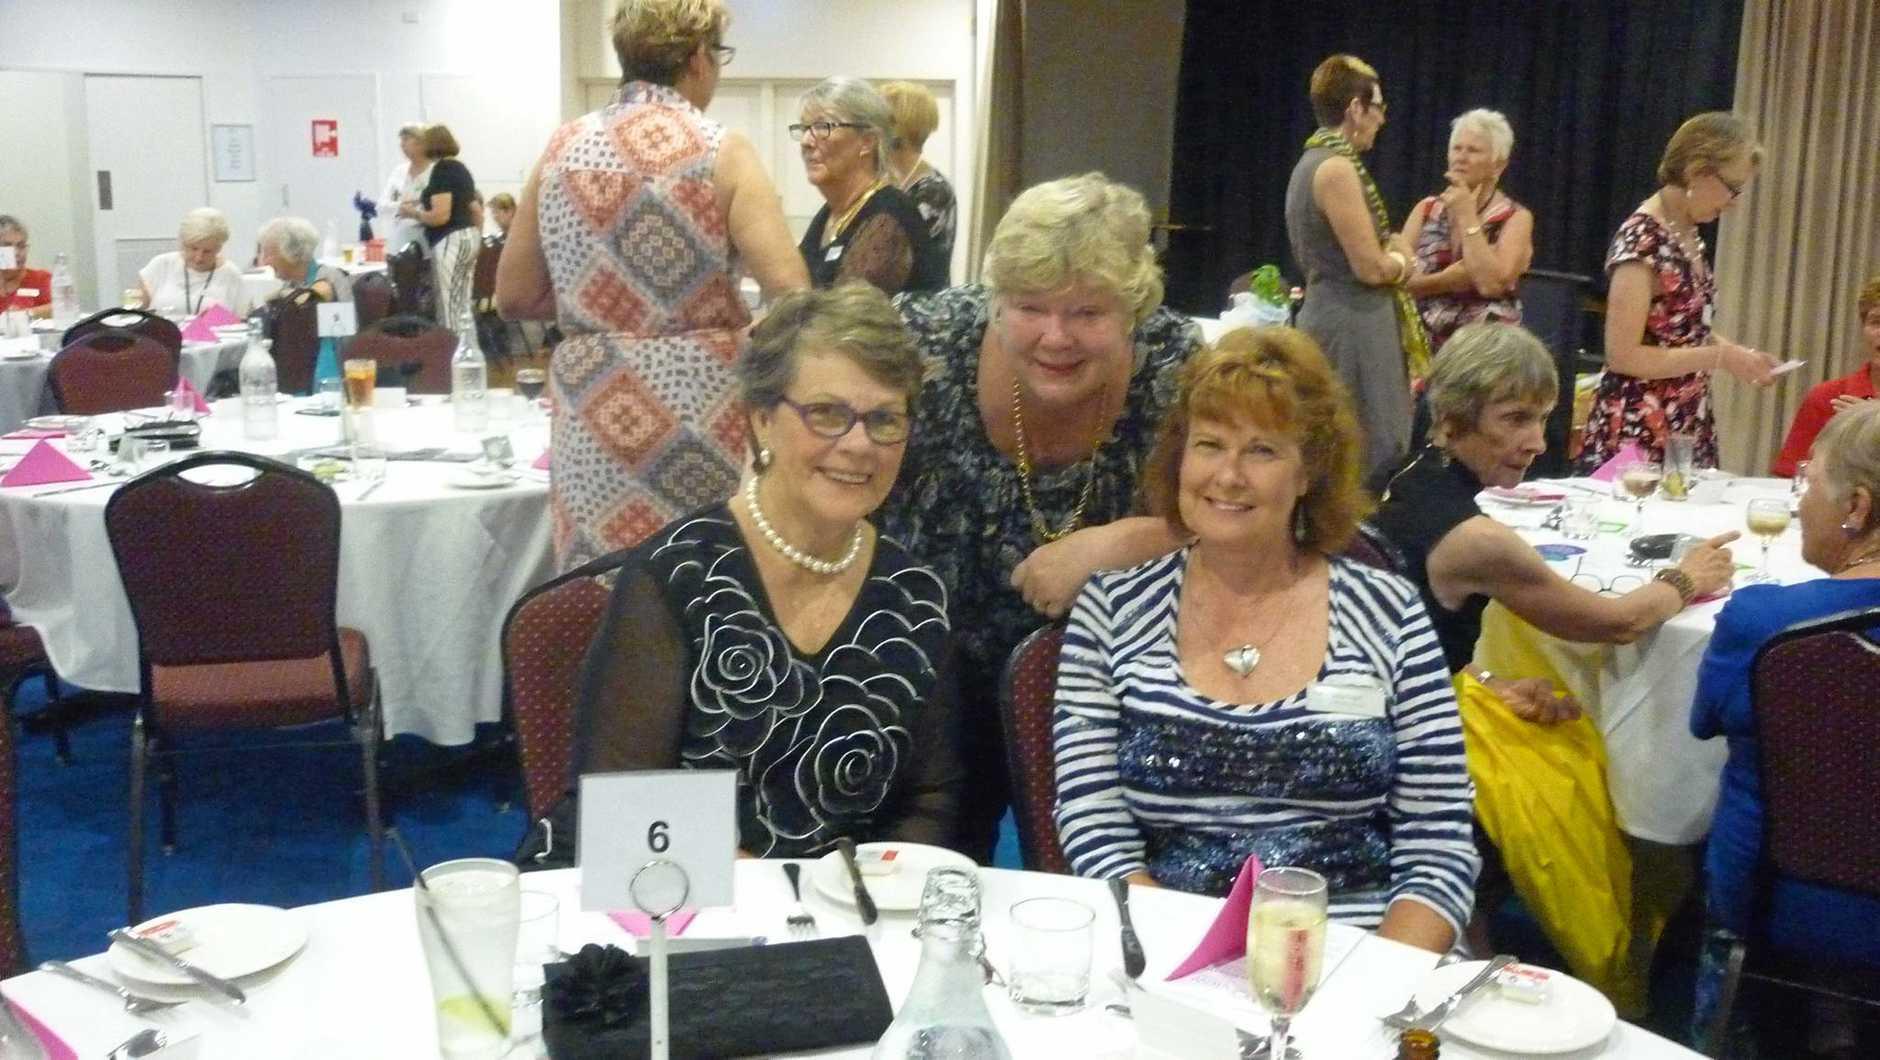 Caloundra Evening VIEW members Wendy Lonie, Sue Parfitt and Jalna Paget